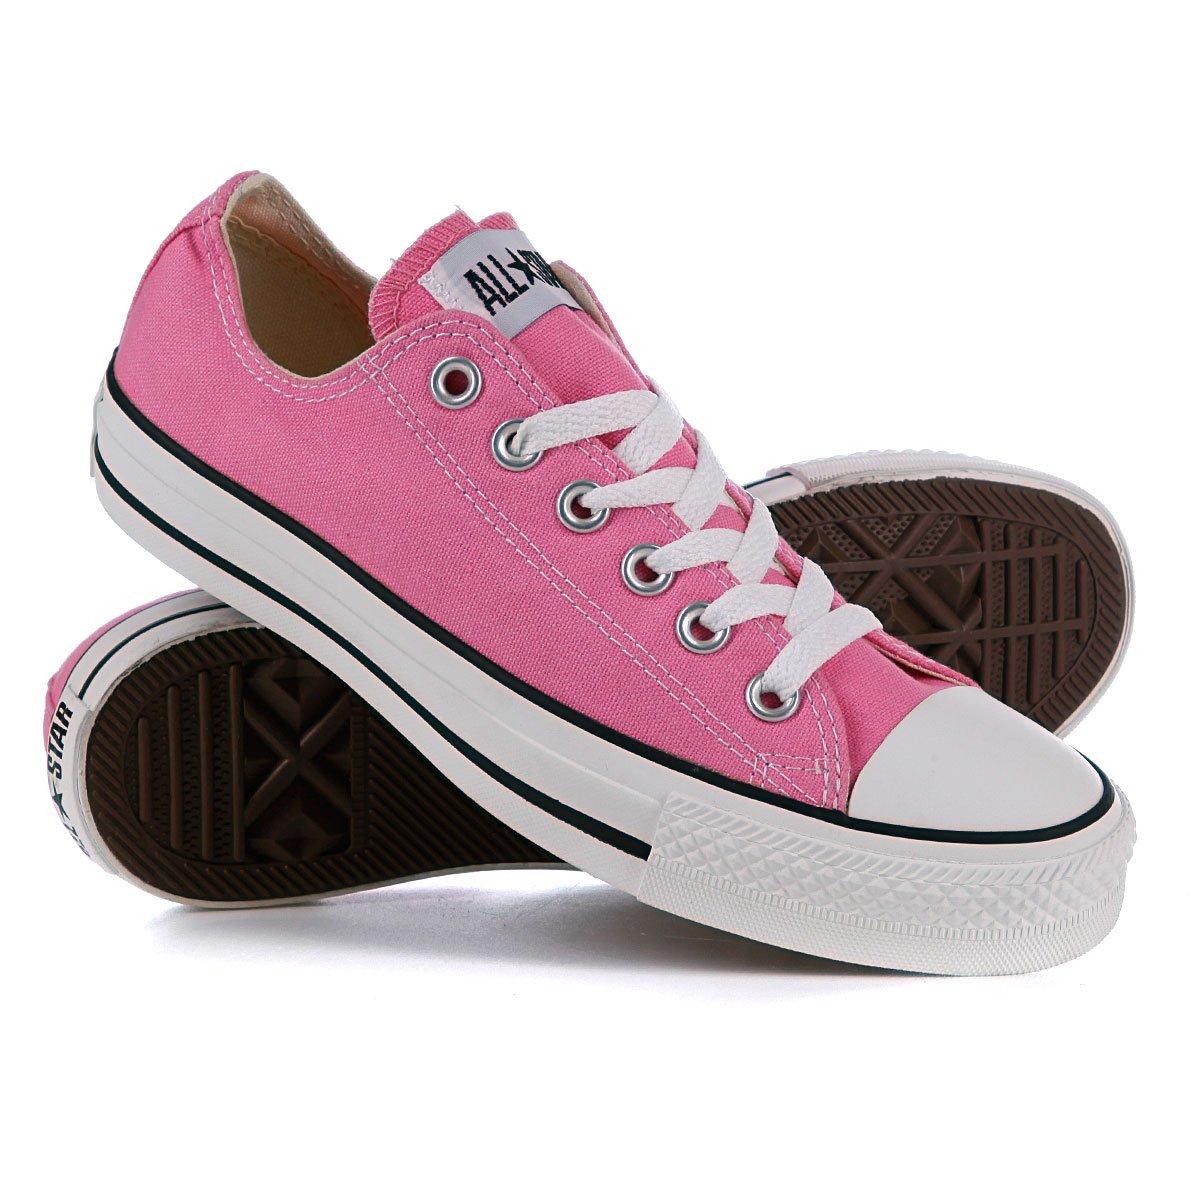 Купить кеды Converse Chuck Taylor All Star Ox Unisex M9007 Pink ... bf68abd437b